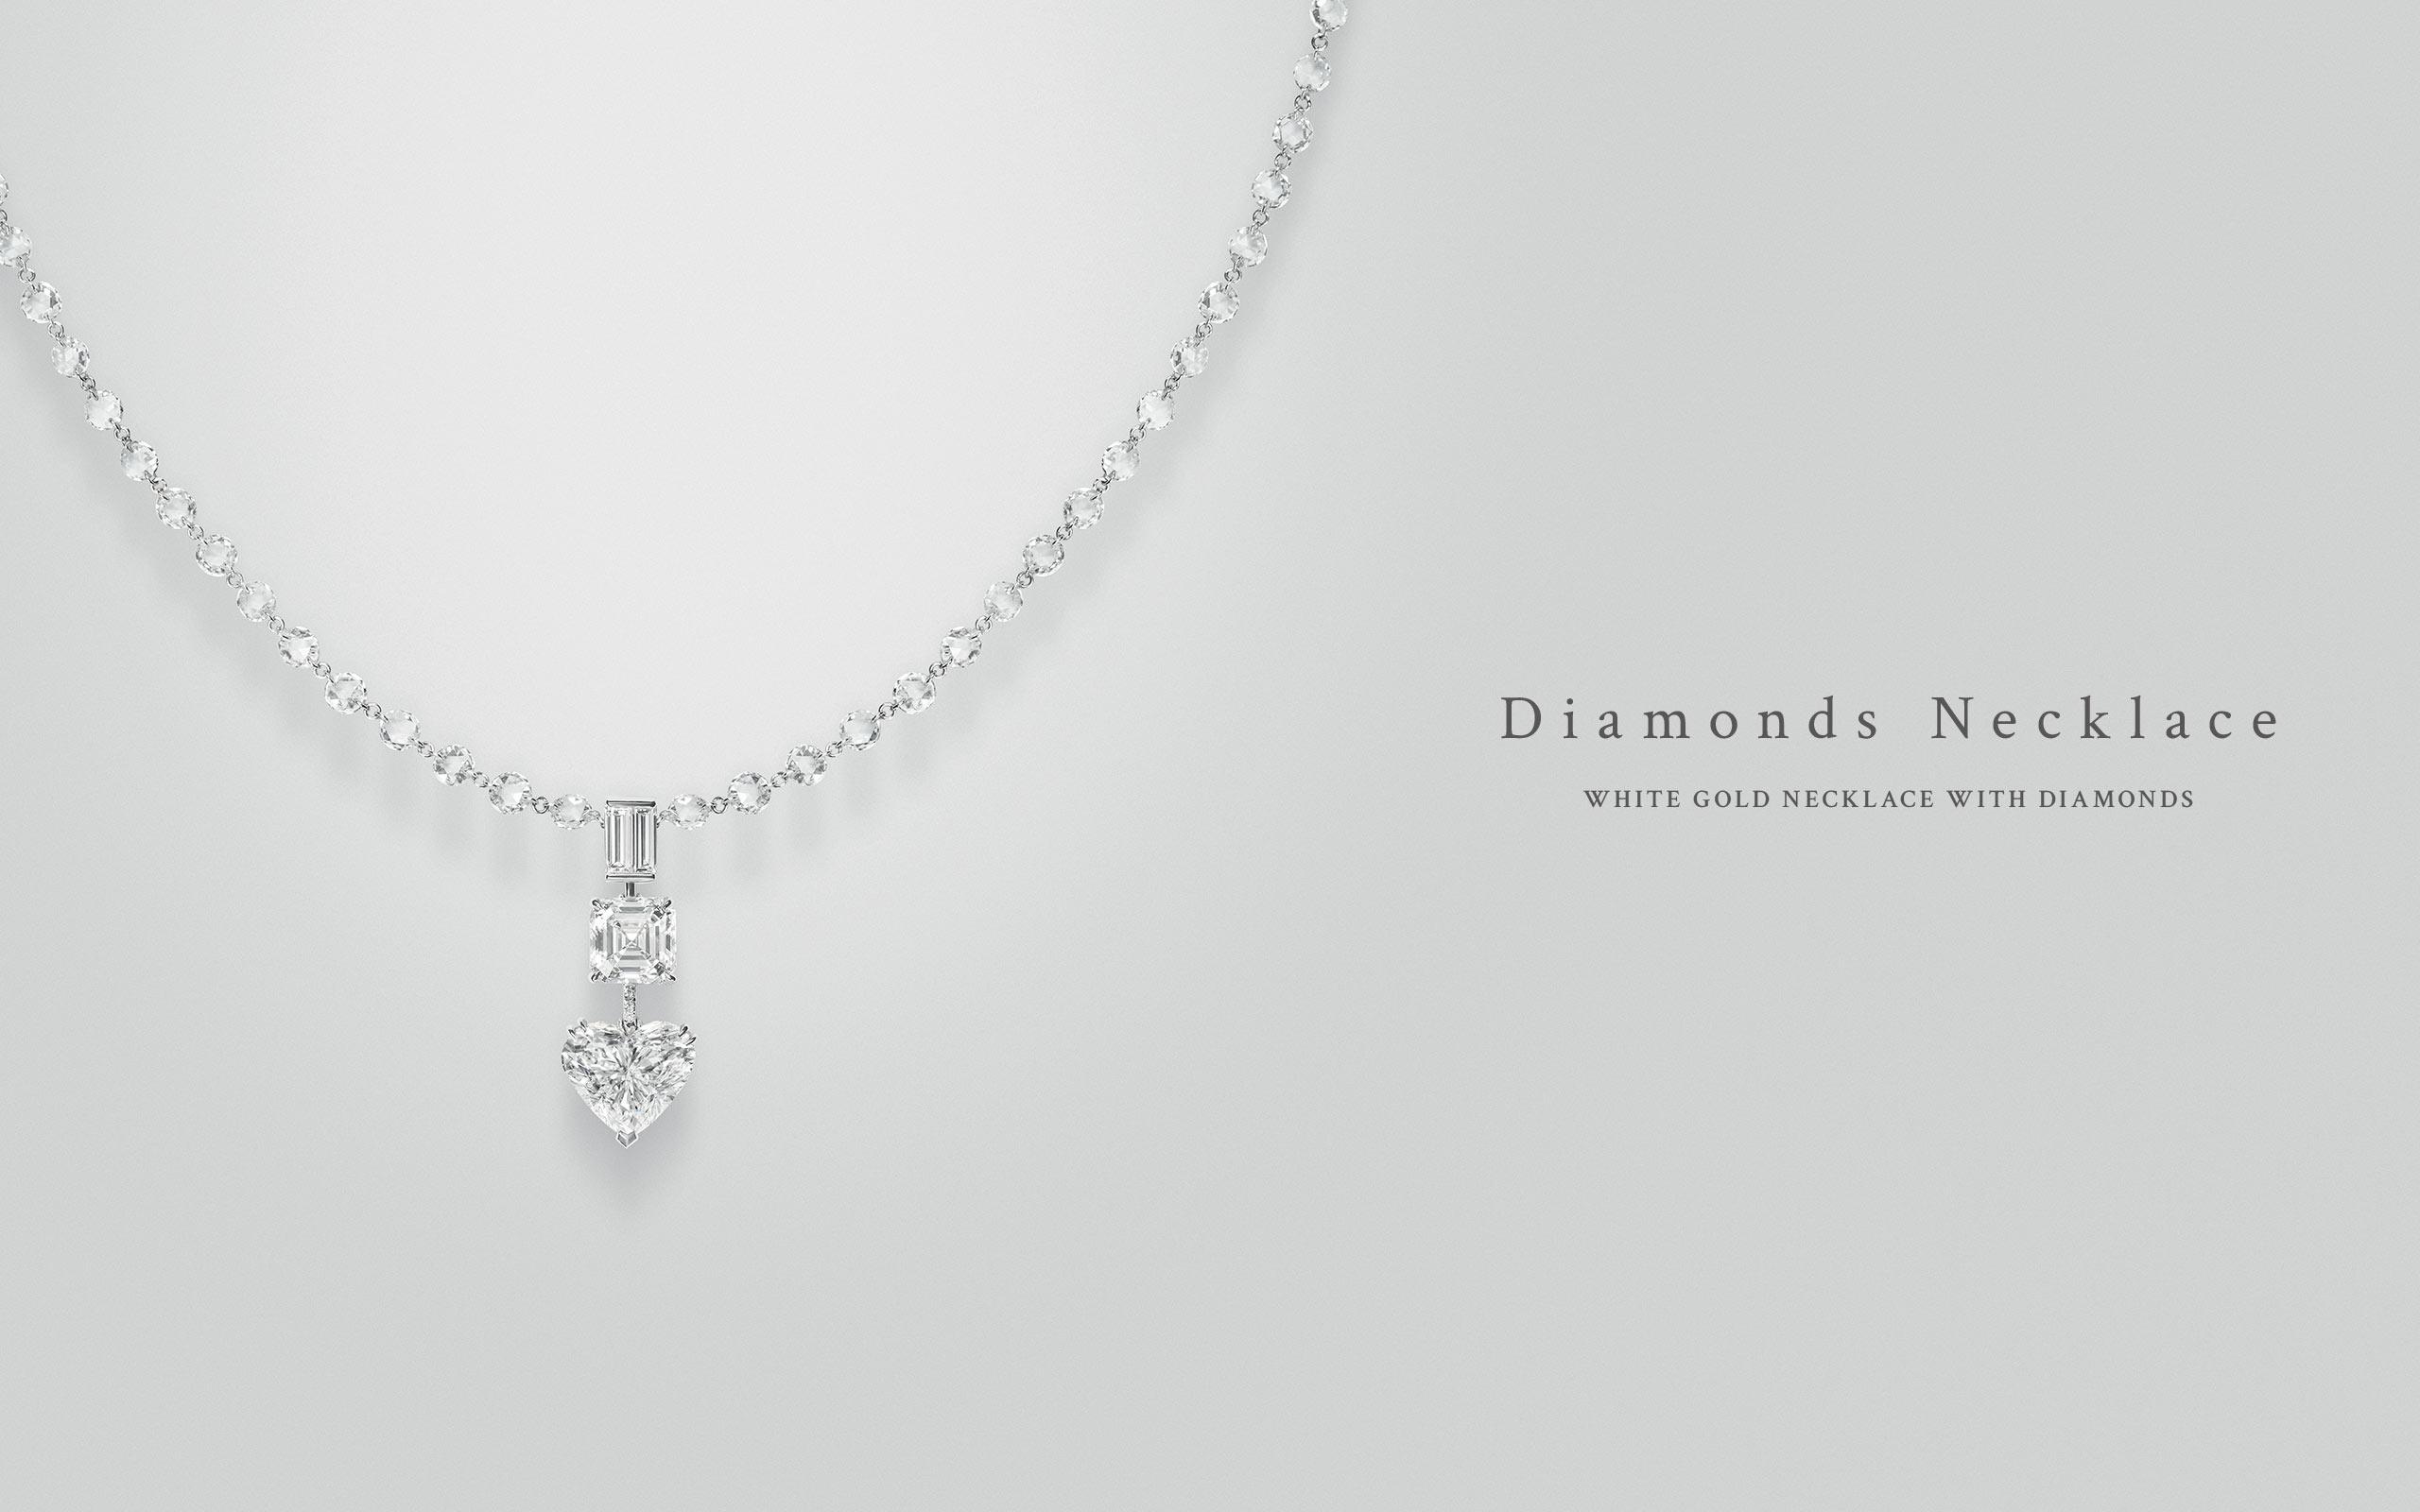 Diamonds Necklace 01 | Maria Gaspari